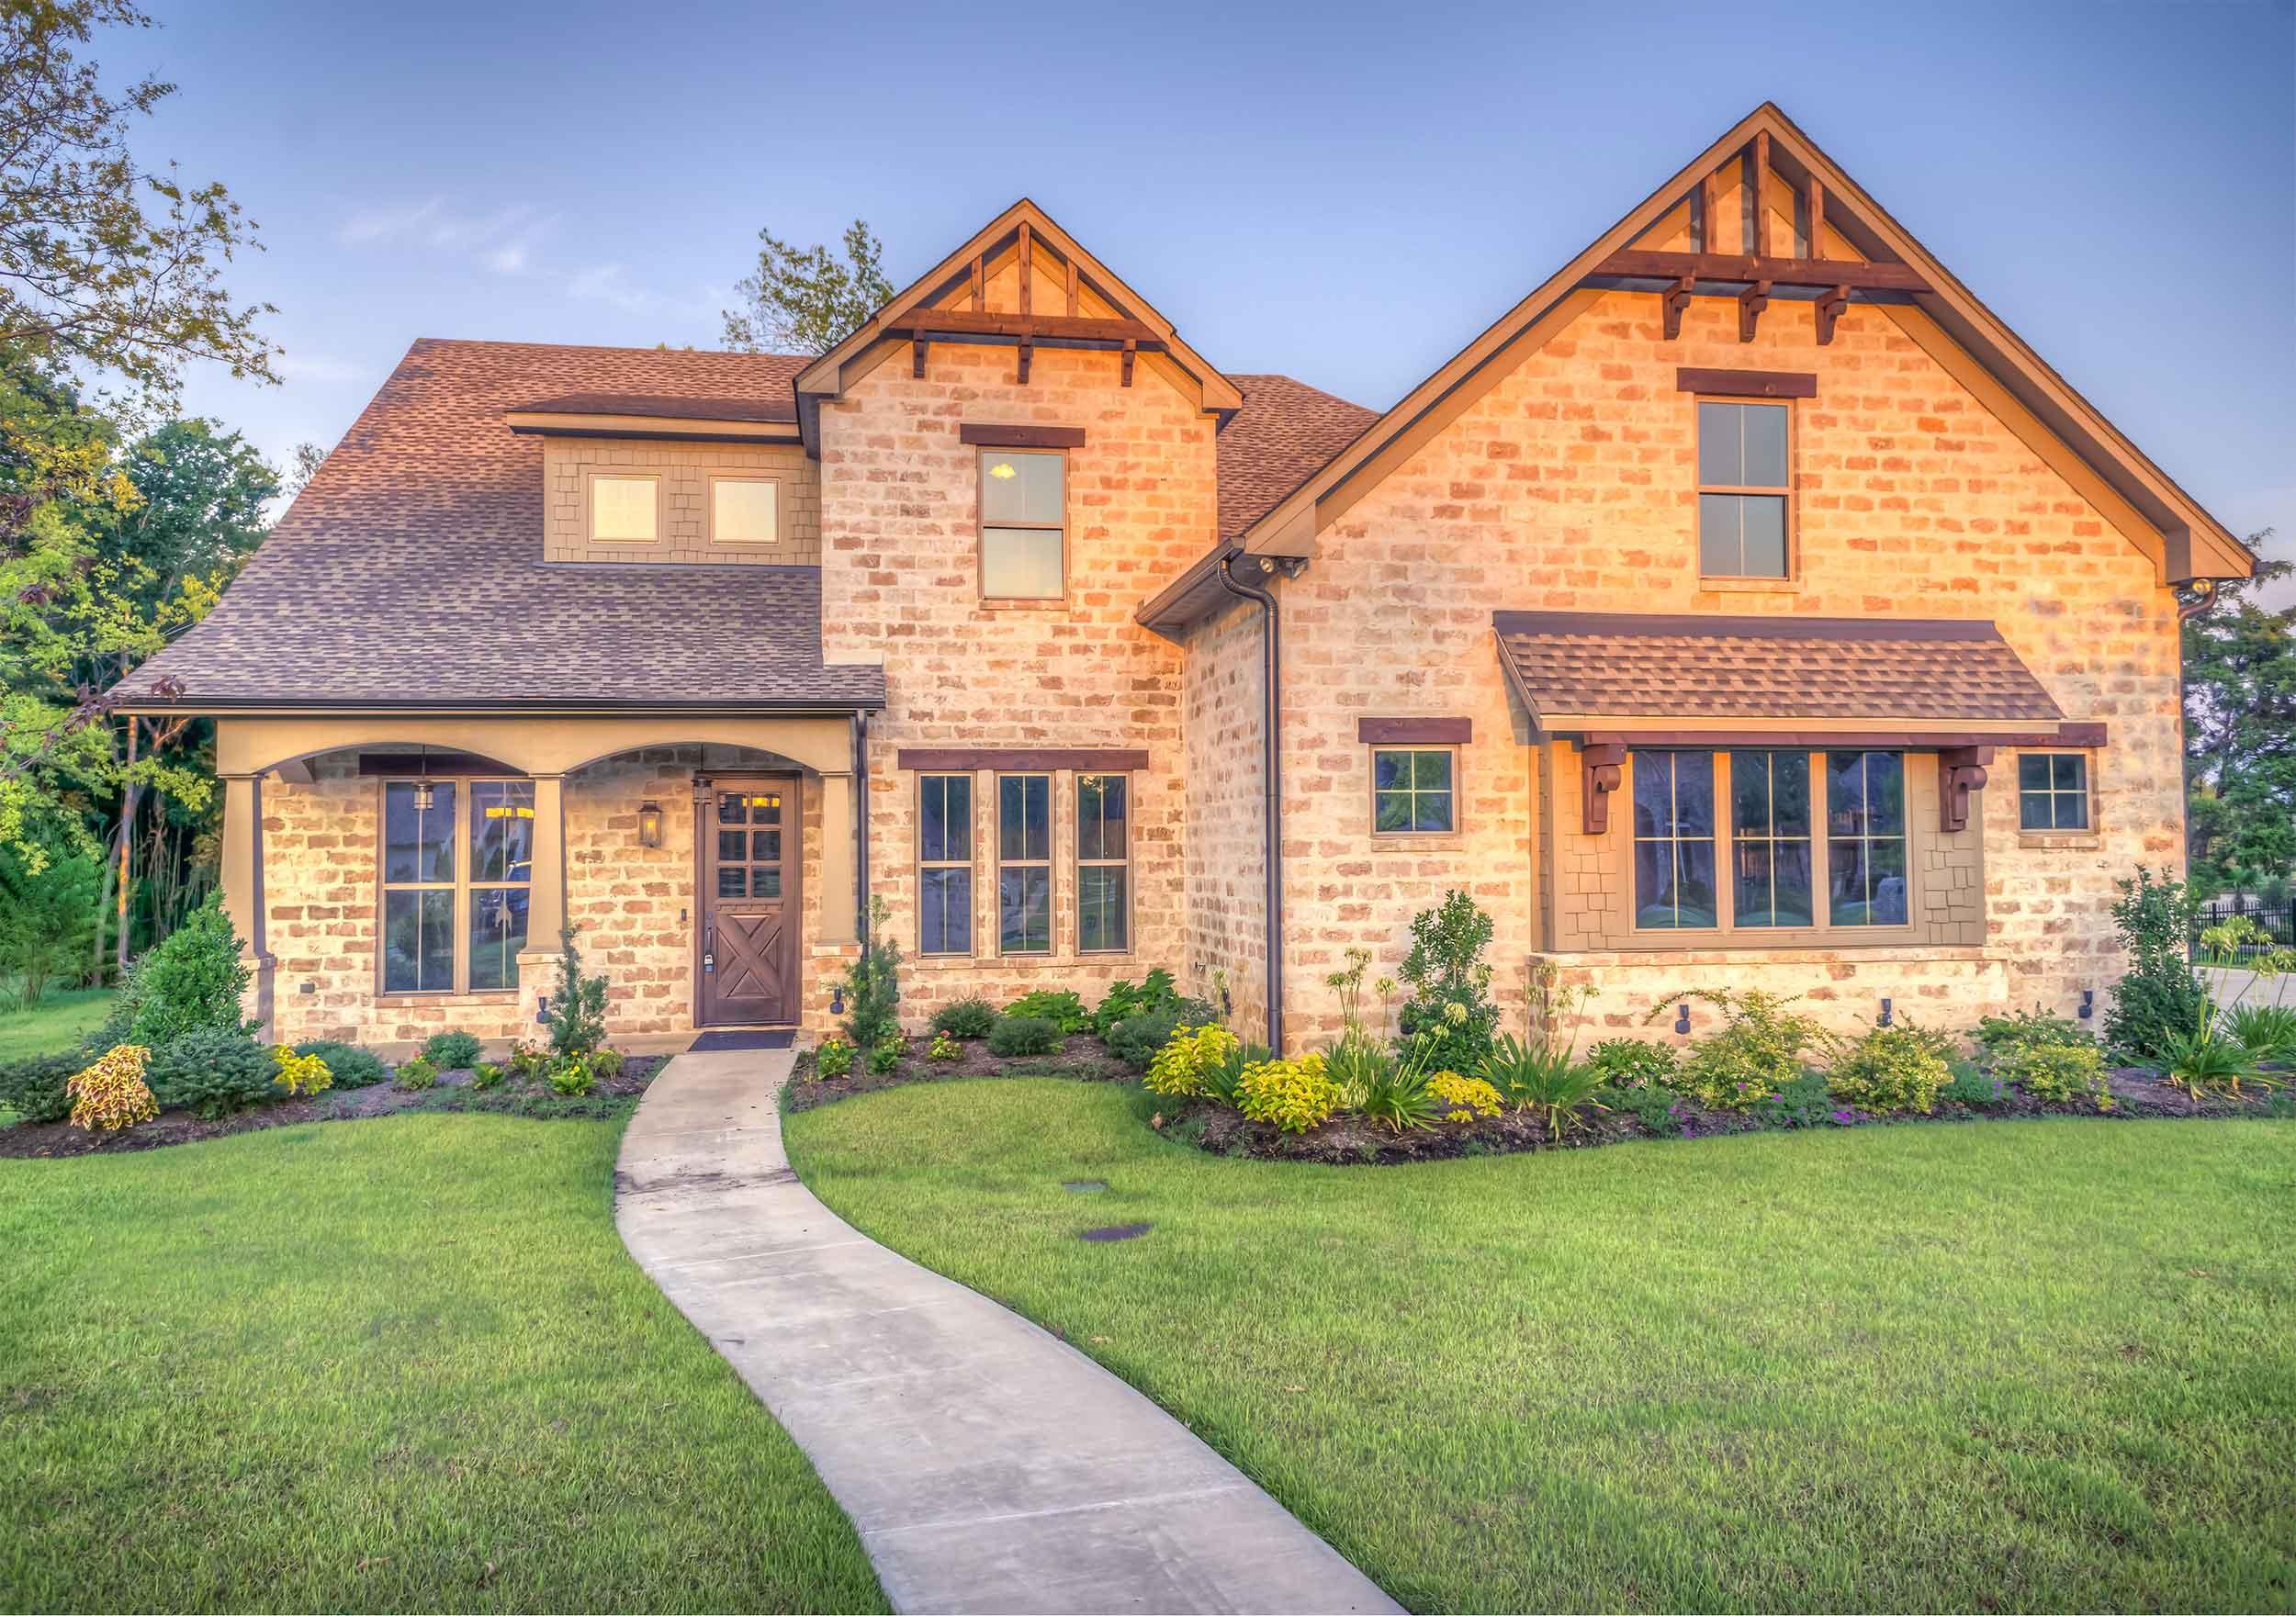 photo of brick house